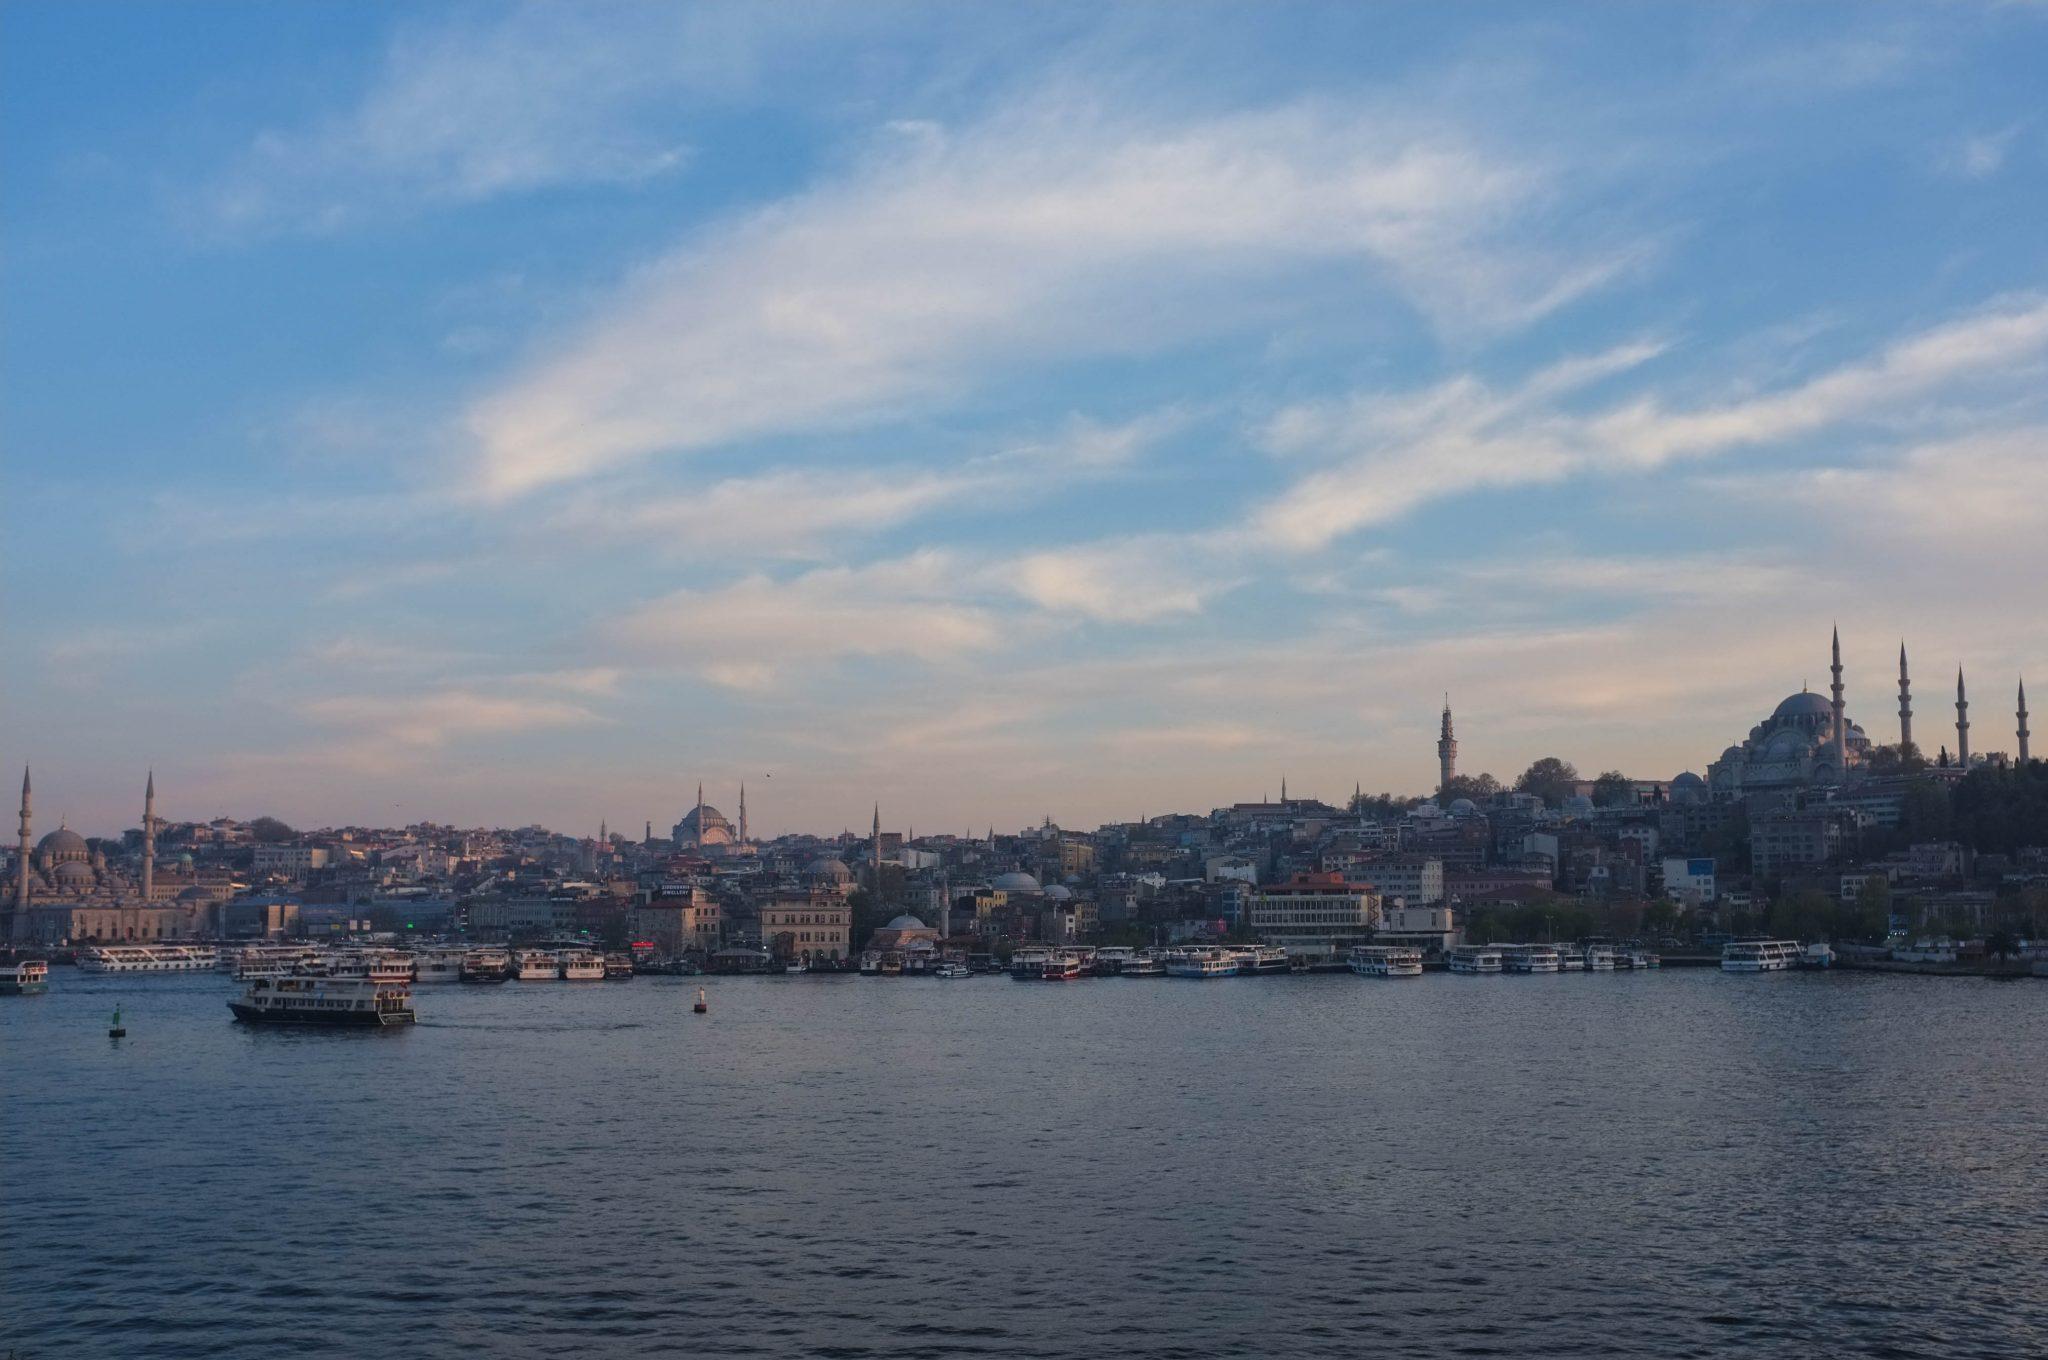 Istanbulin siluetti